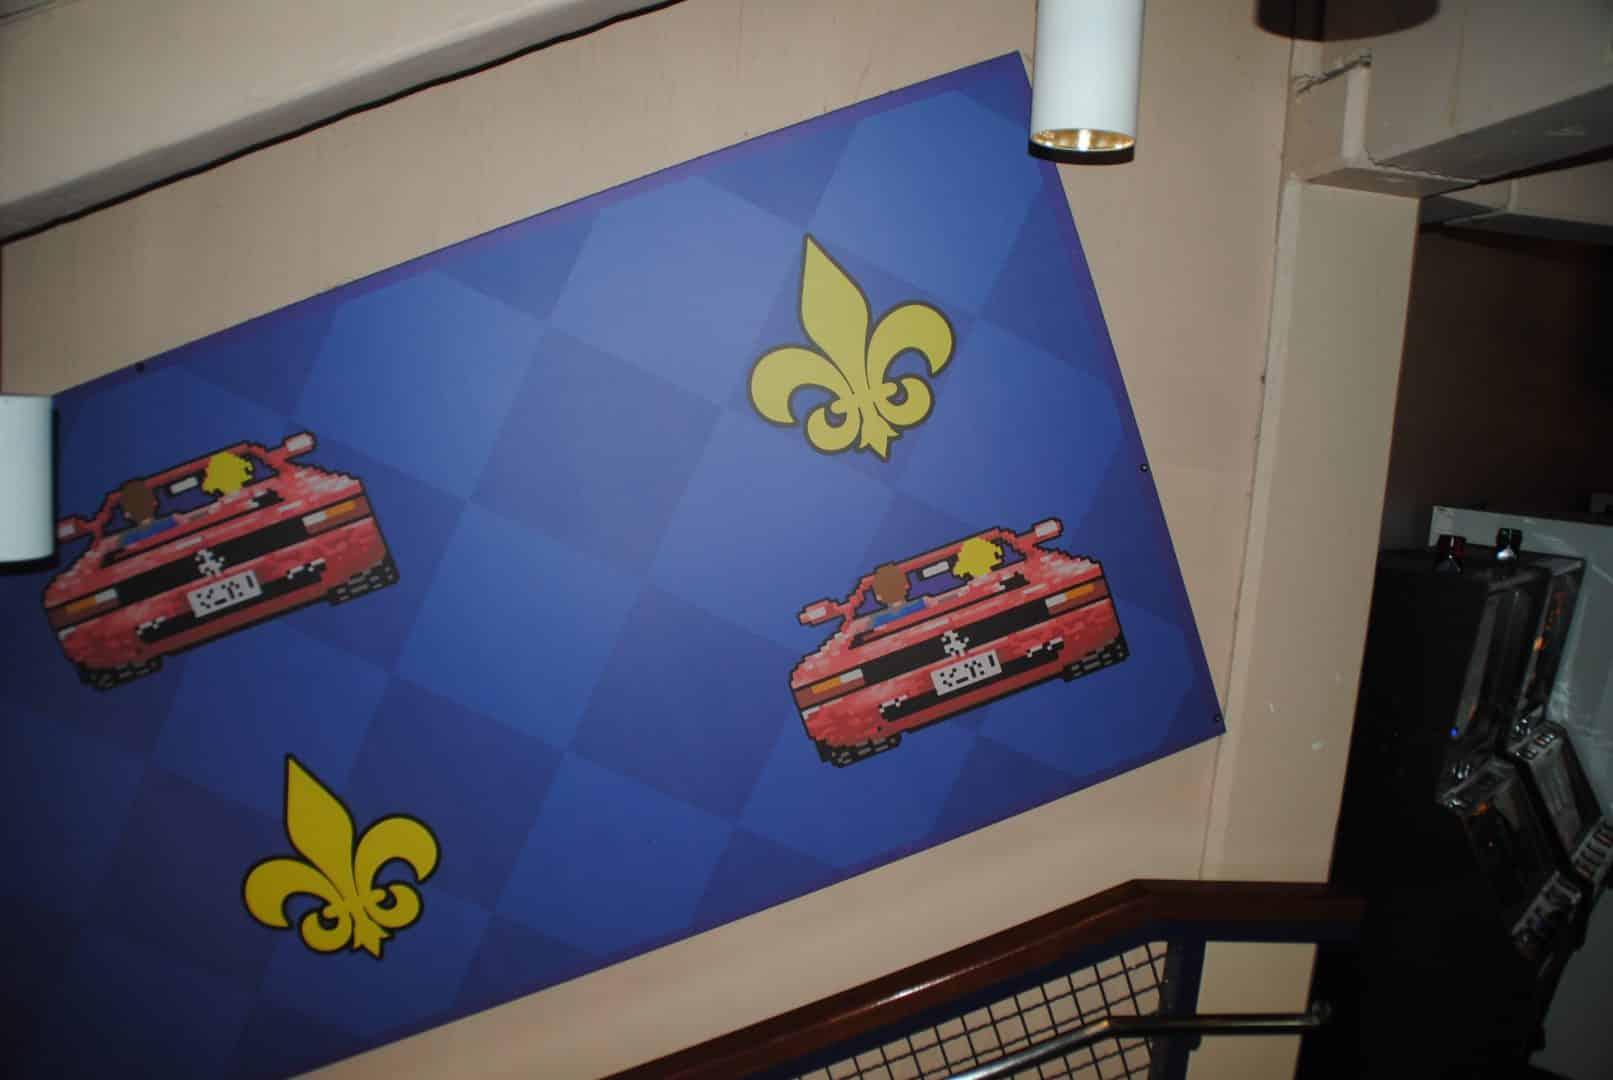 OutRun wall stuff :-) / At Liseberg Fun Fair